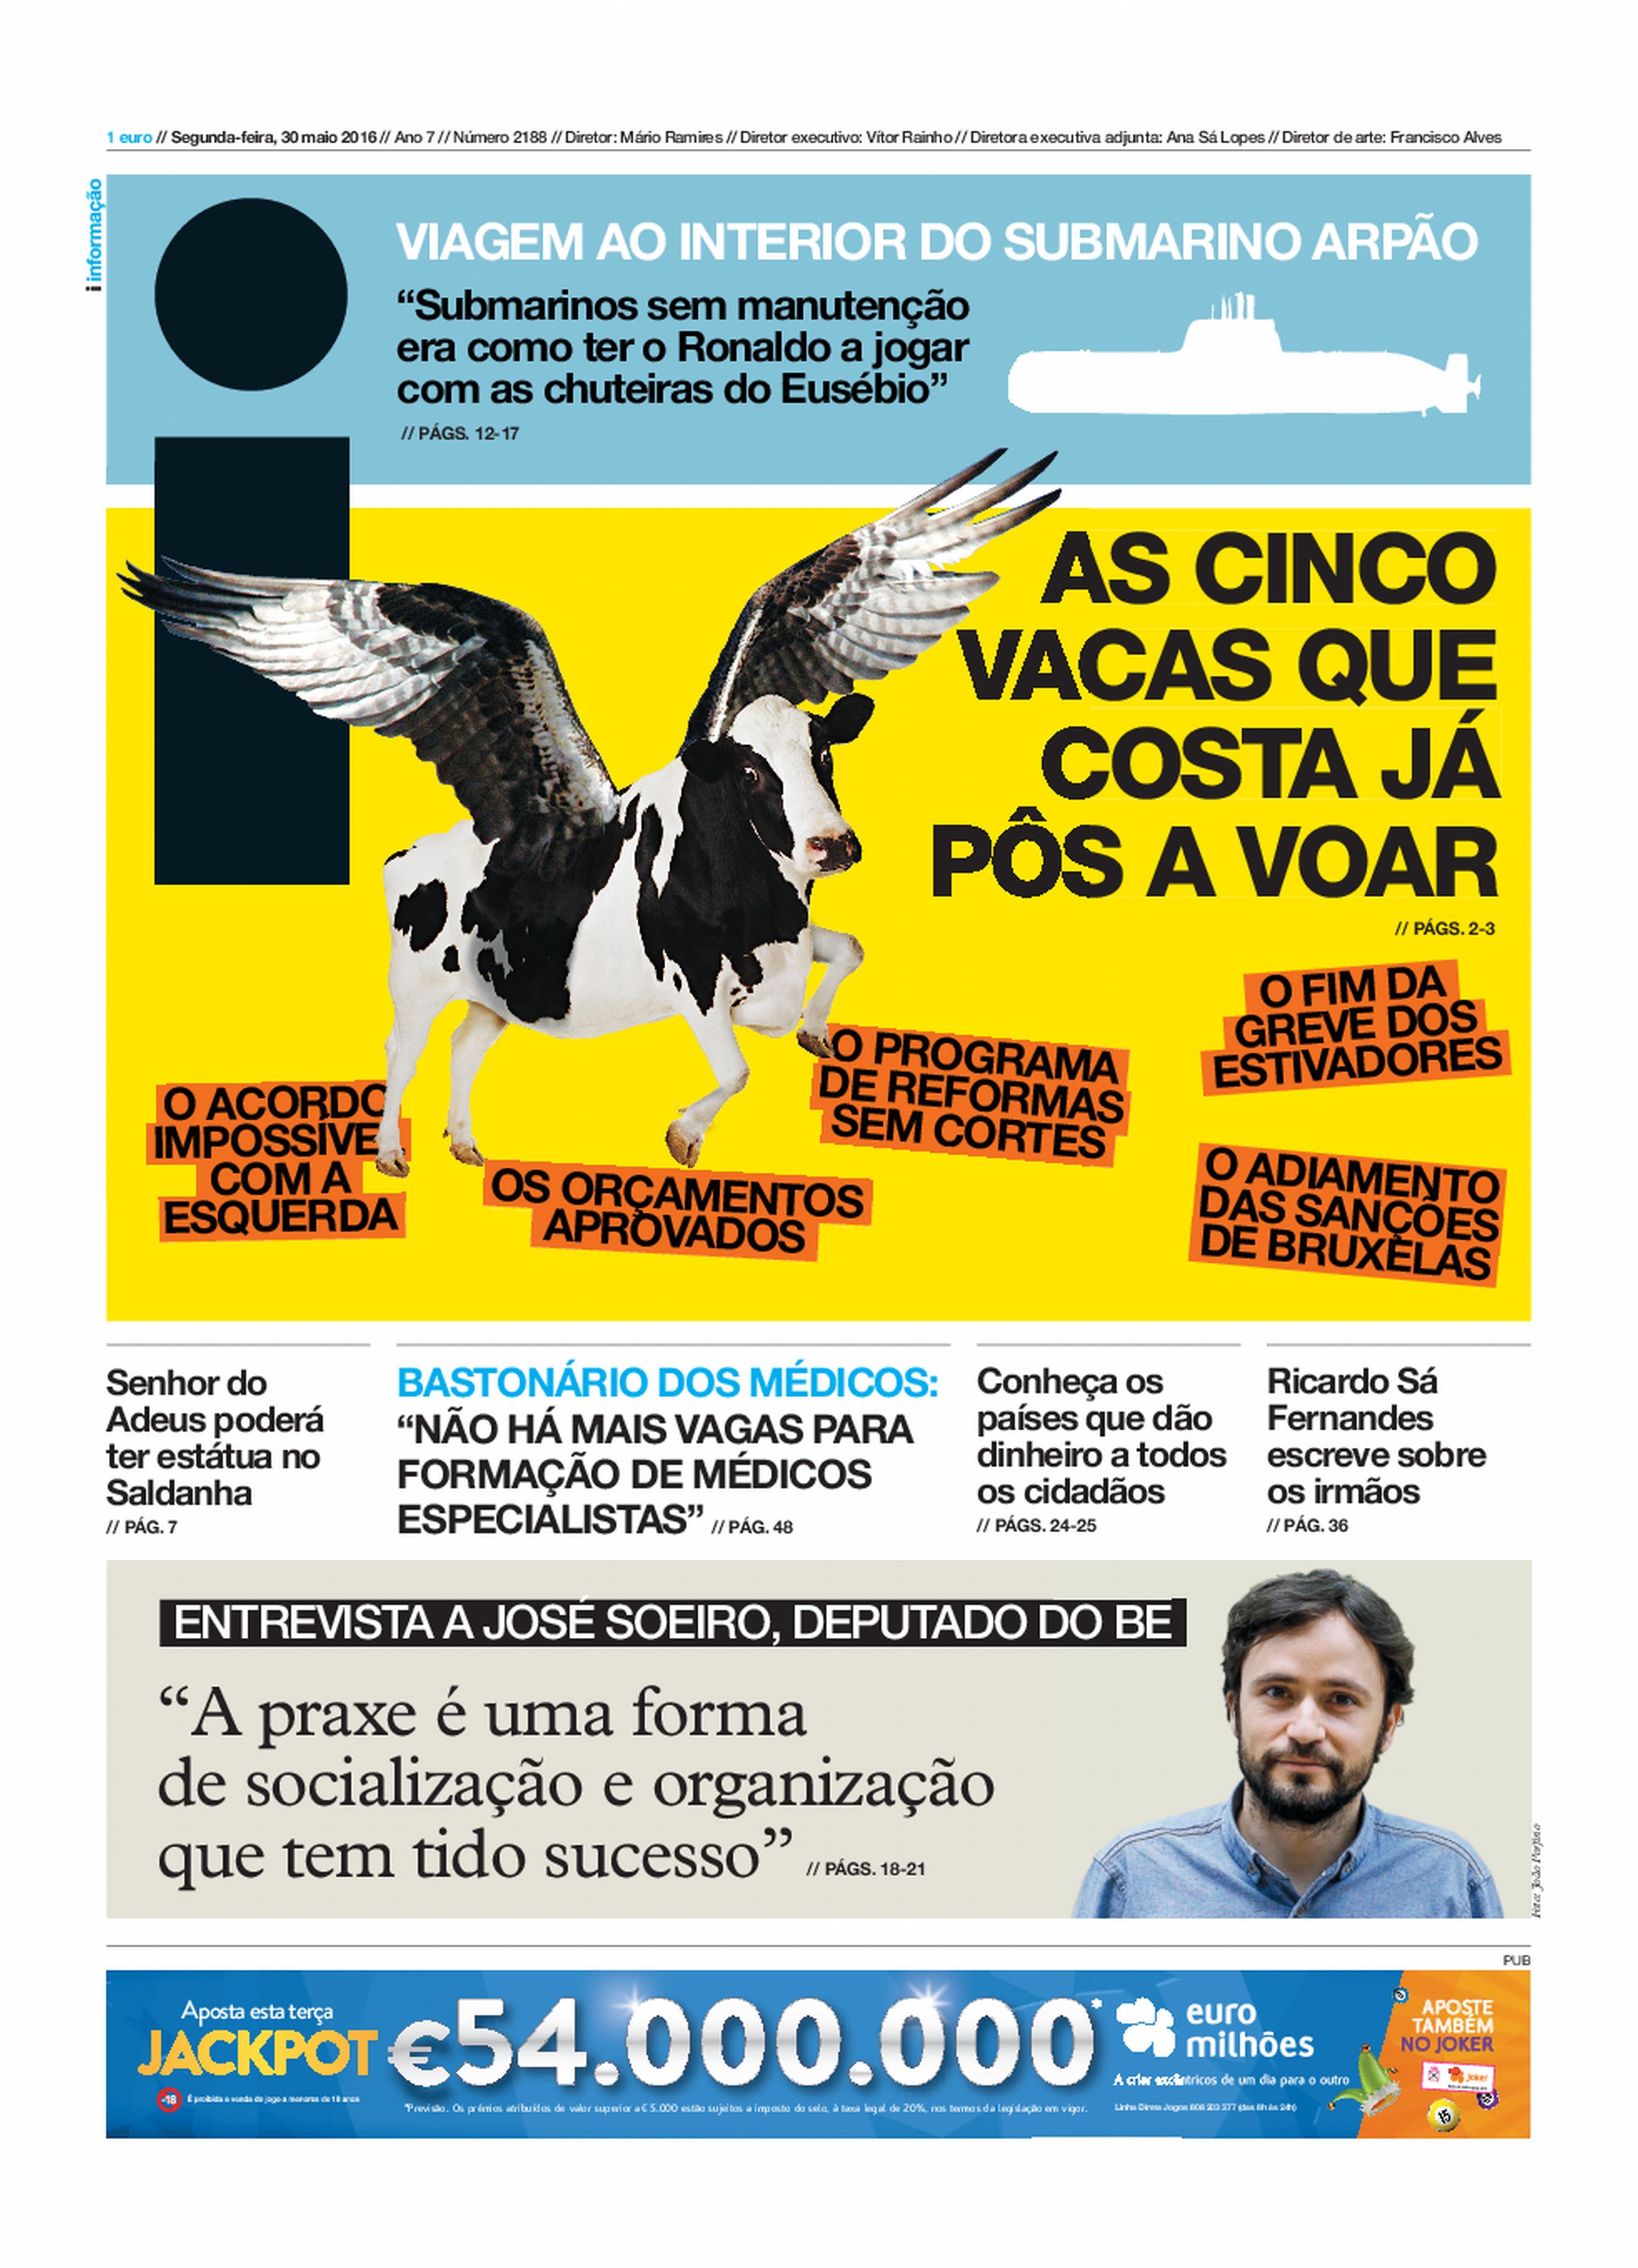 capa_jornal_i_30_05_2016.jpg